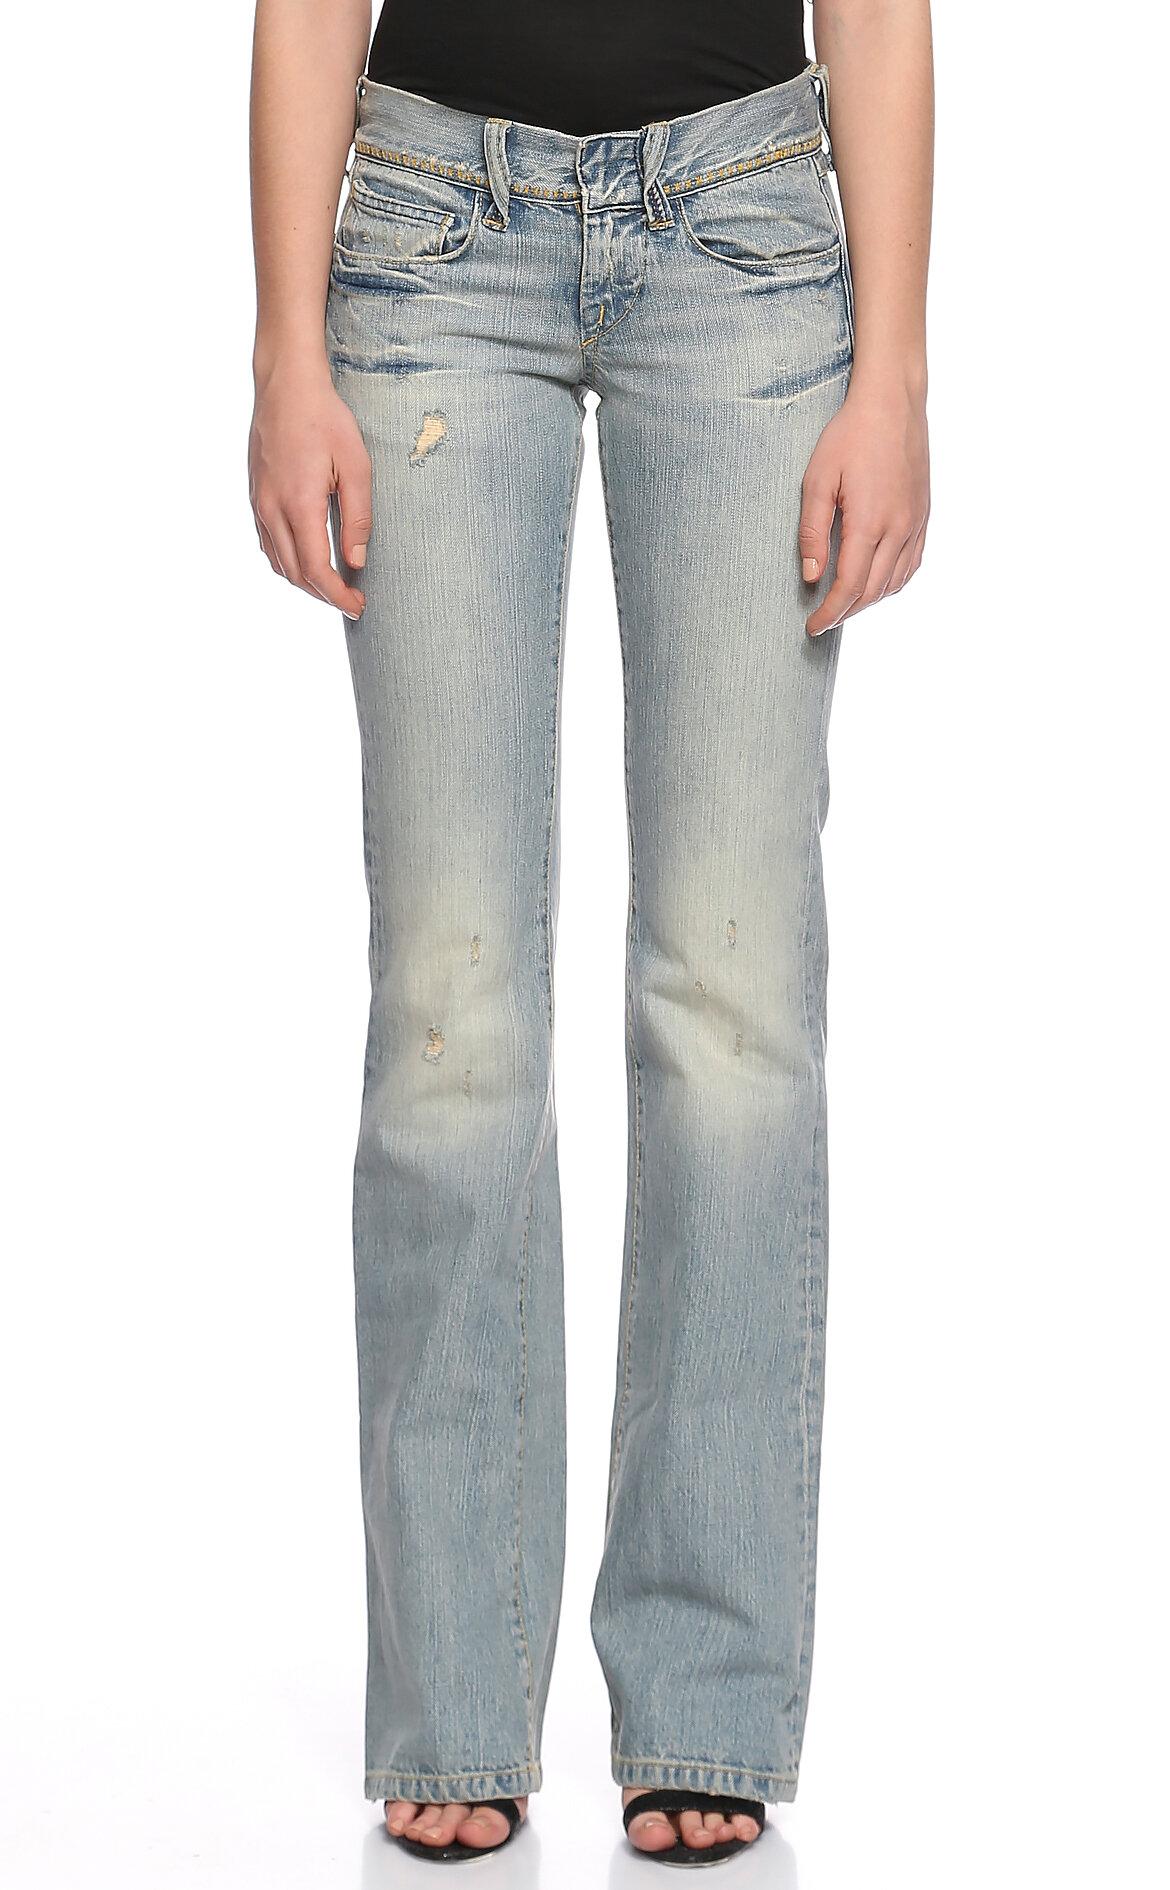 Fornarina Jeans-Fornarina Jeans Jean Pantolon